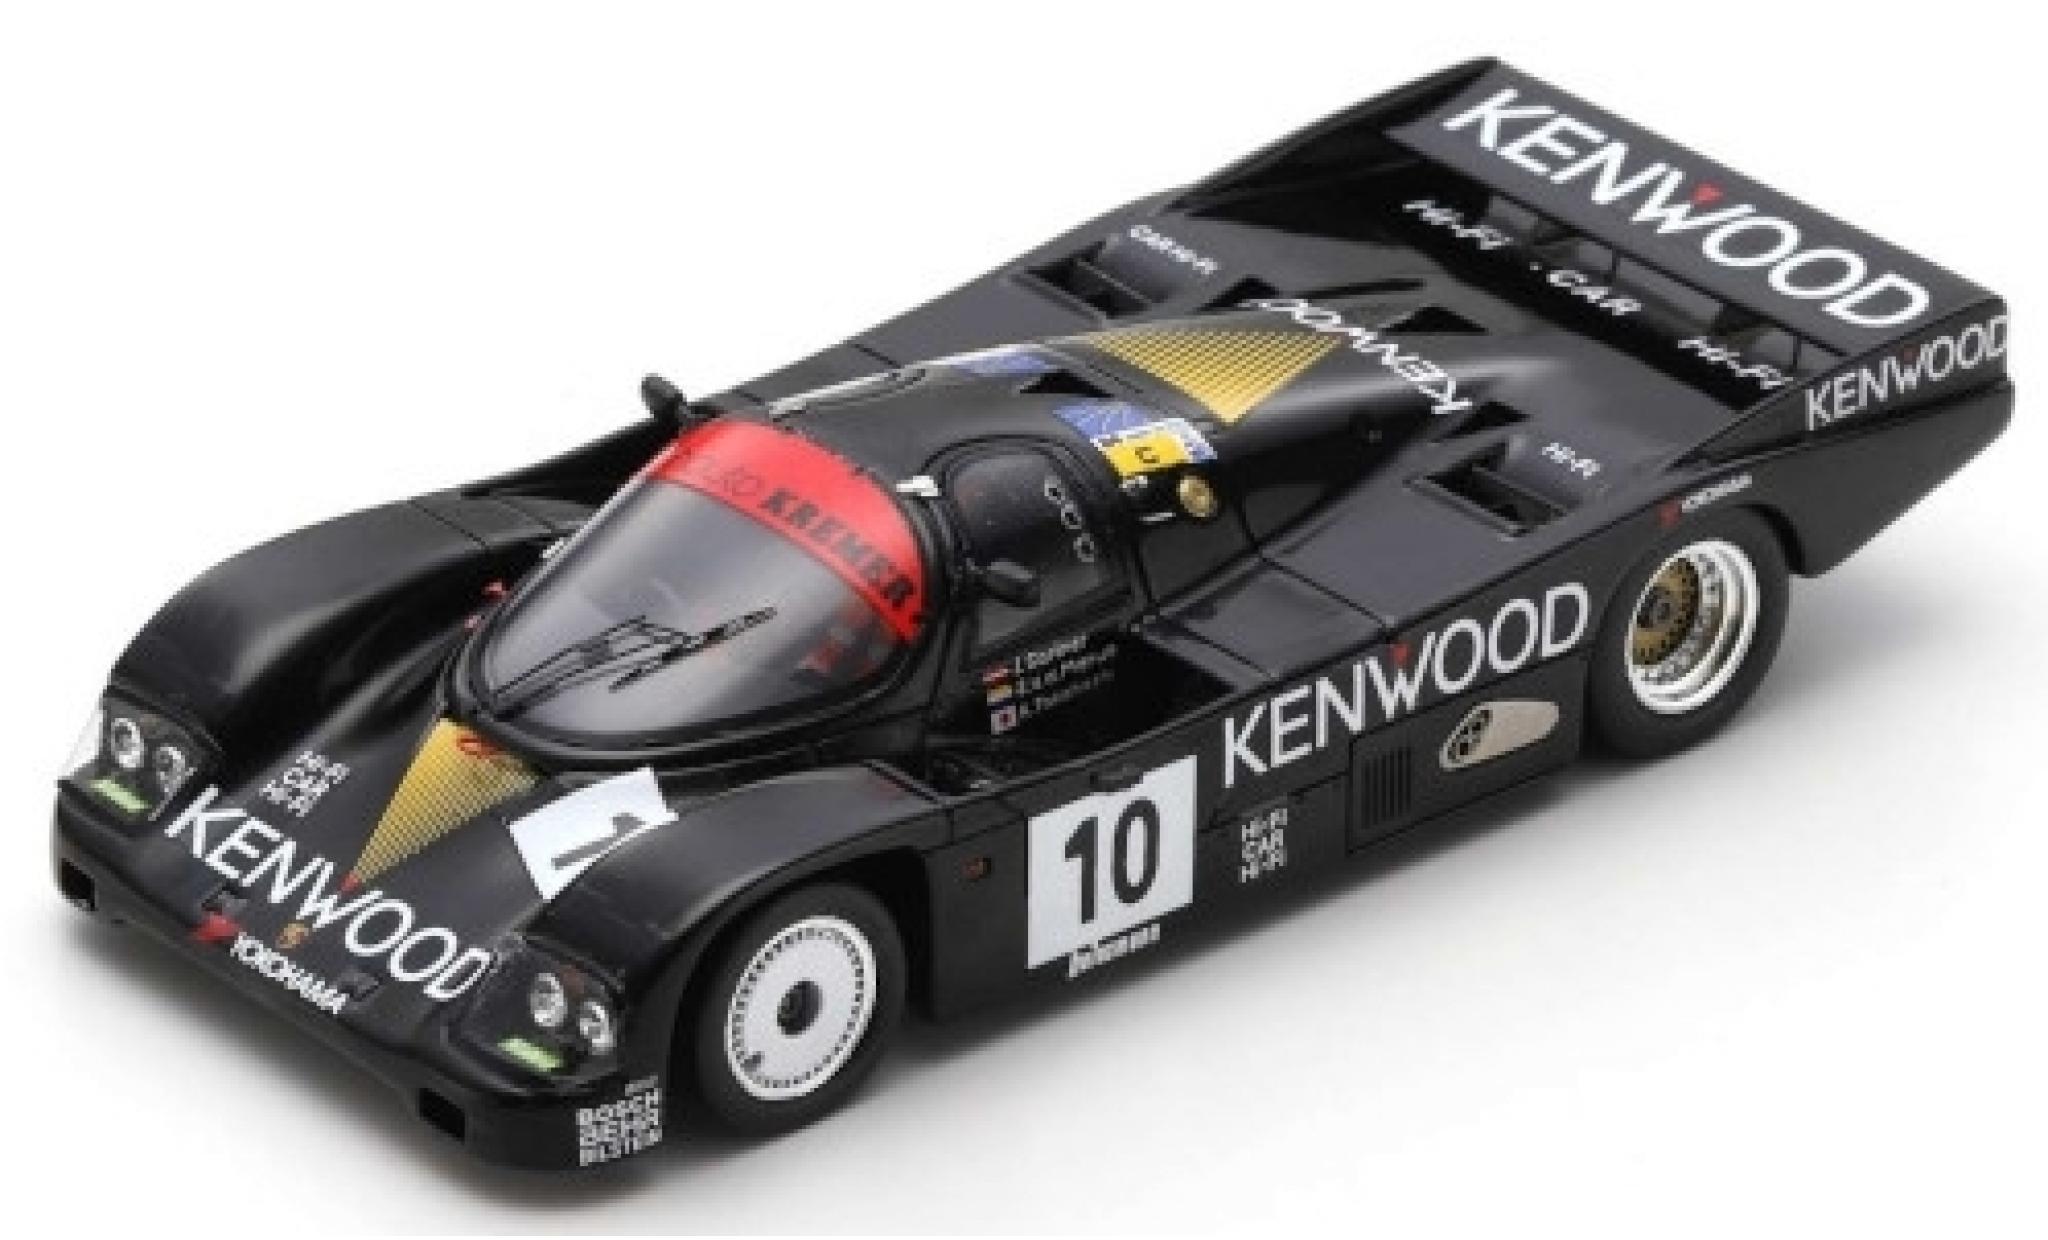 Porsche 962 1986 1/43 Spark C RHD No.10 Kremer Racing Kenwood 24h Le Mans J.Gartner/S.van der Merwe/K.Takahashi